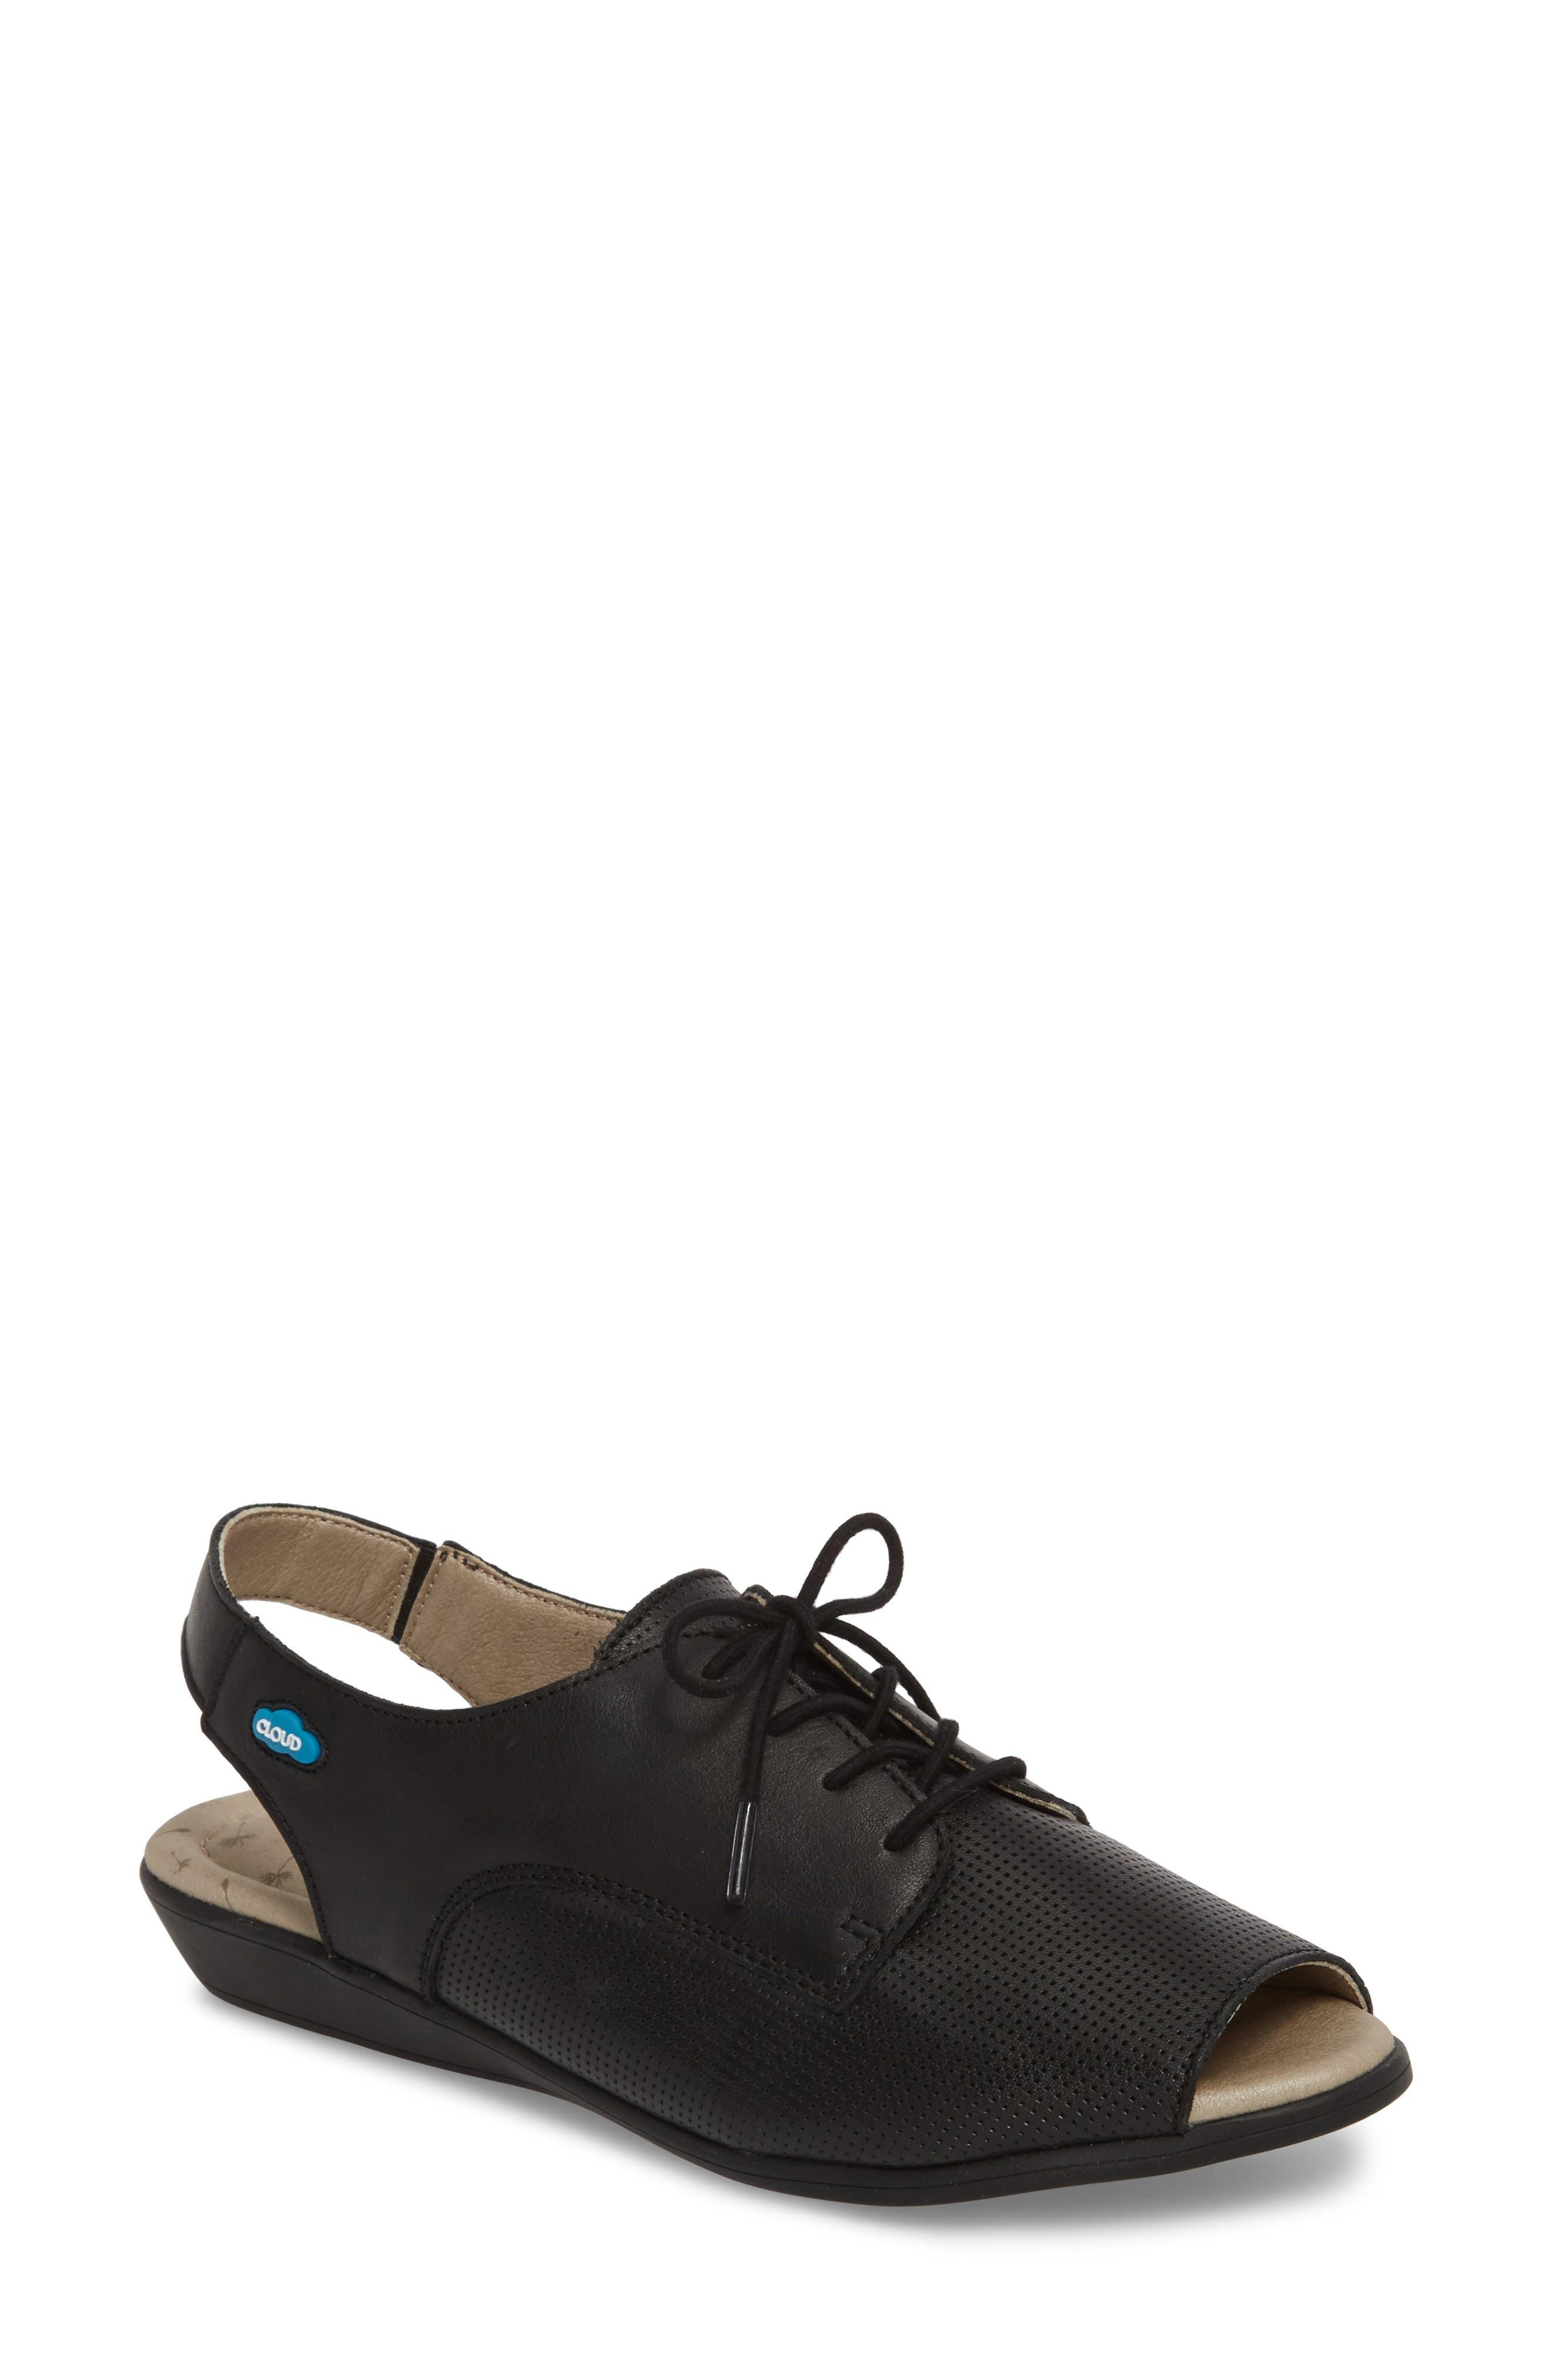 Cleone Slingback Sandal,                         Main,                         color, BLACK LEATHER